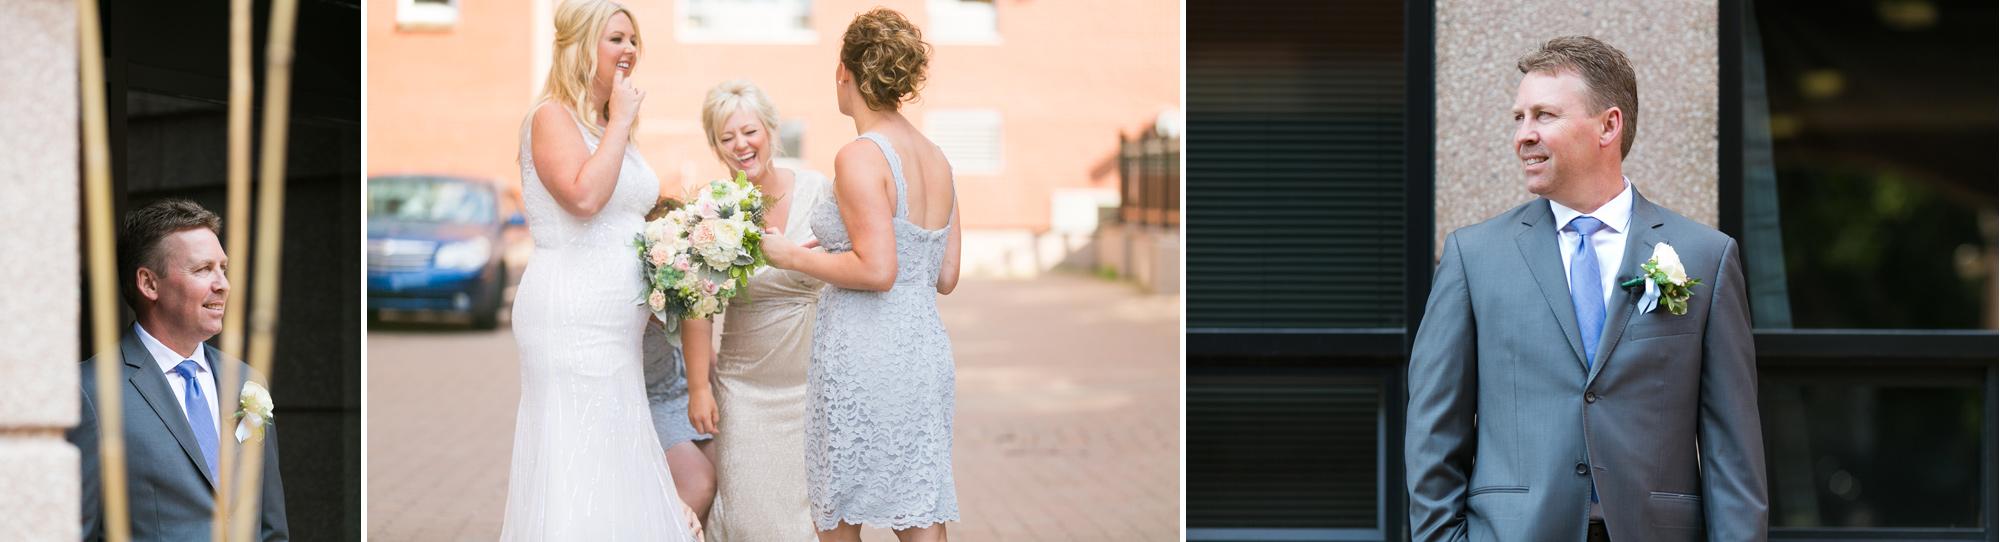 077-lord-nelson-wedding------.jpg